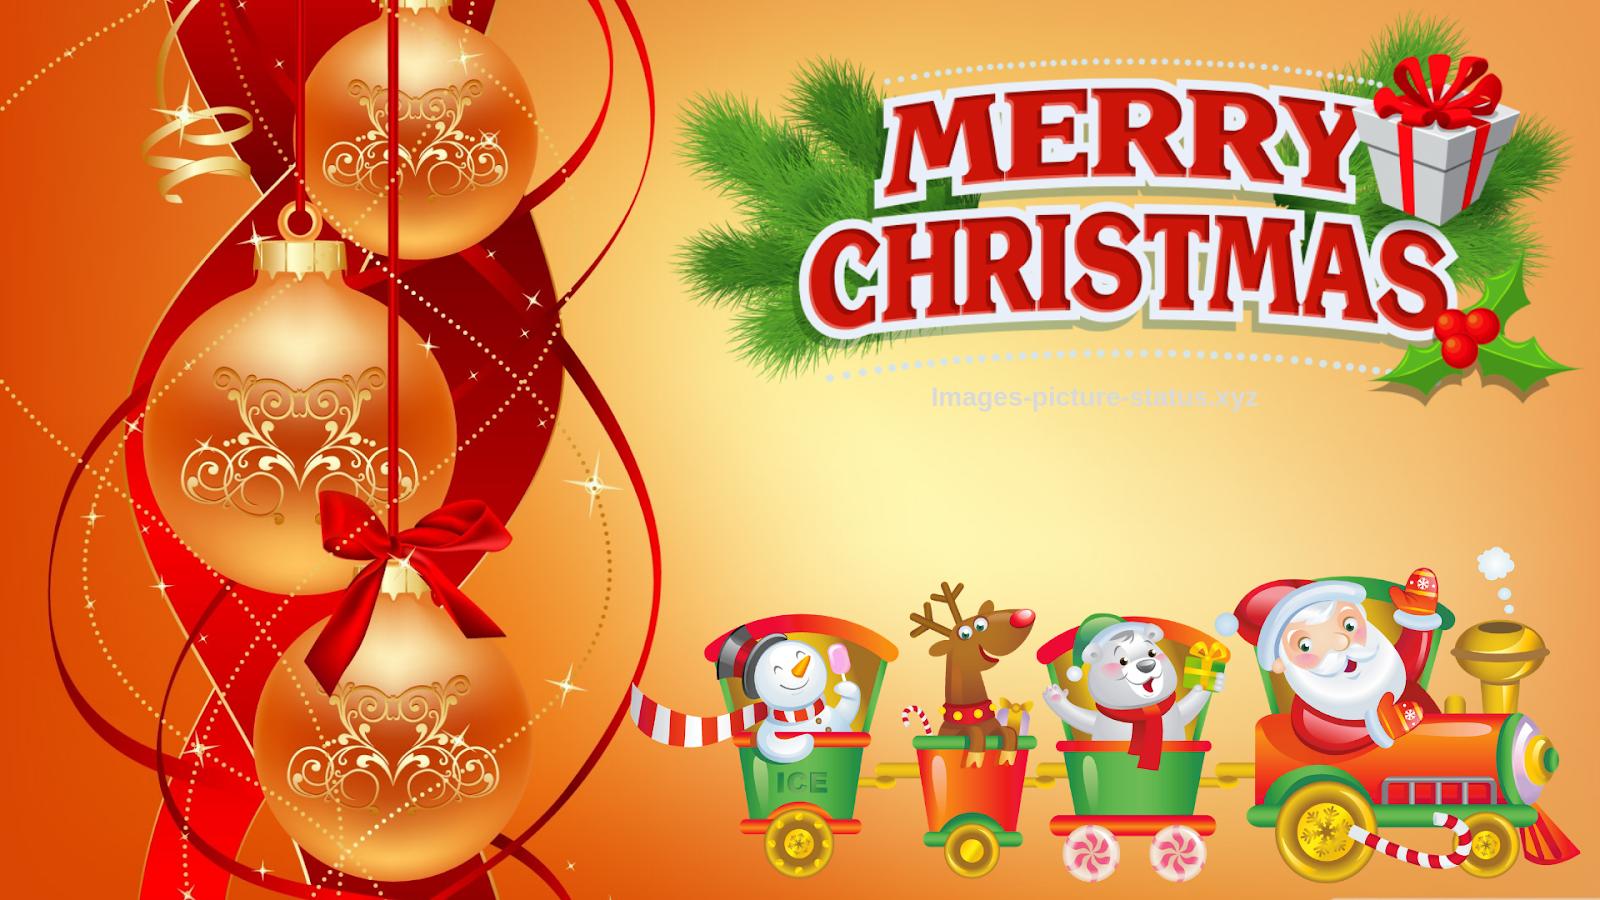 Short Christmas Greetings Short christmas greetings